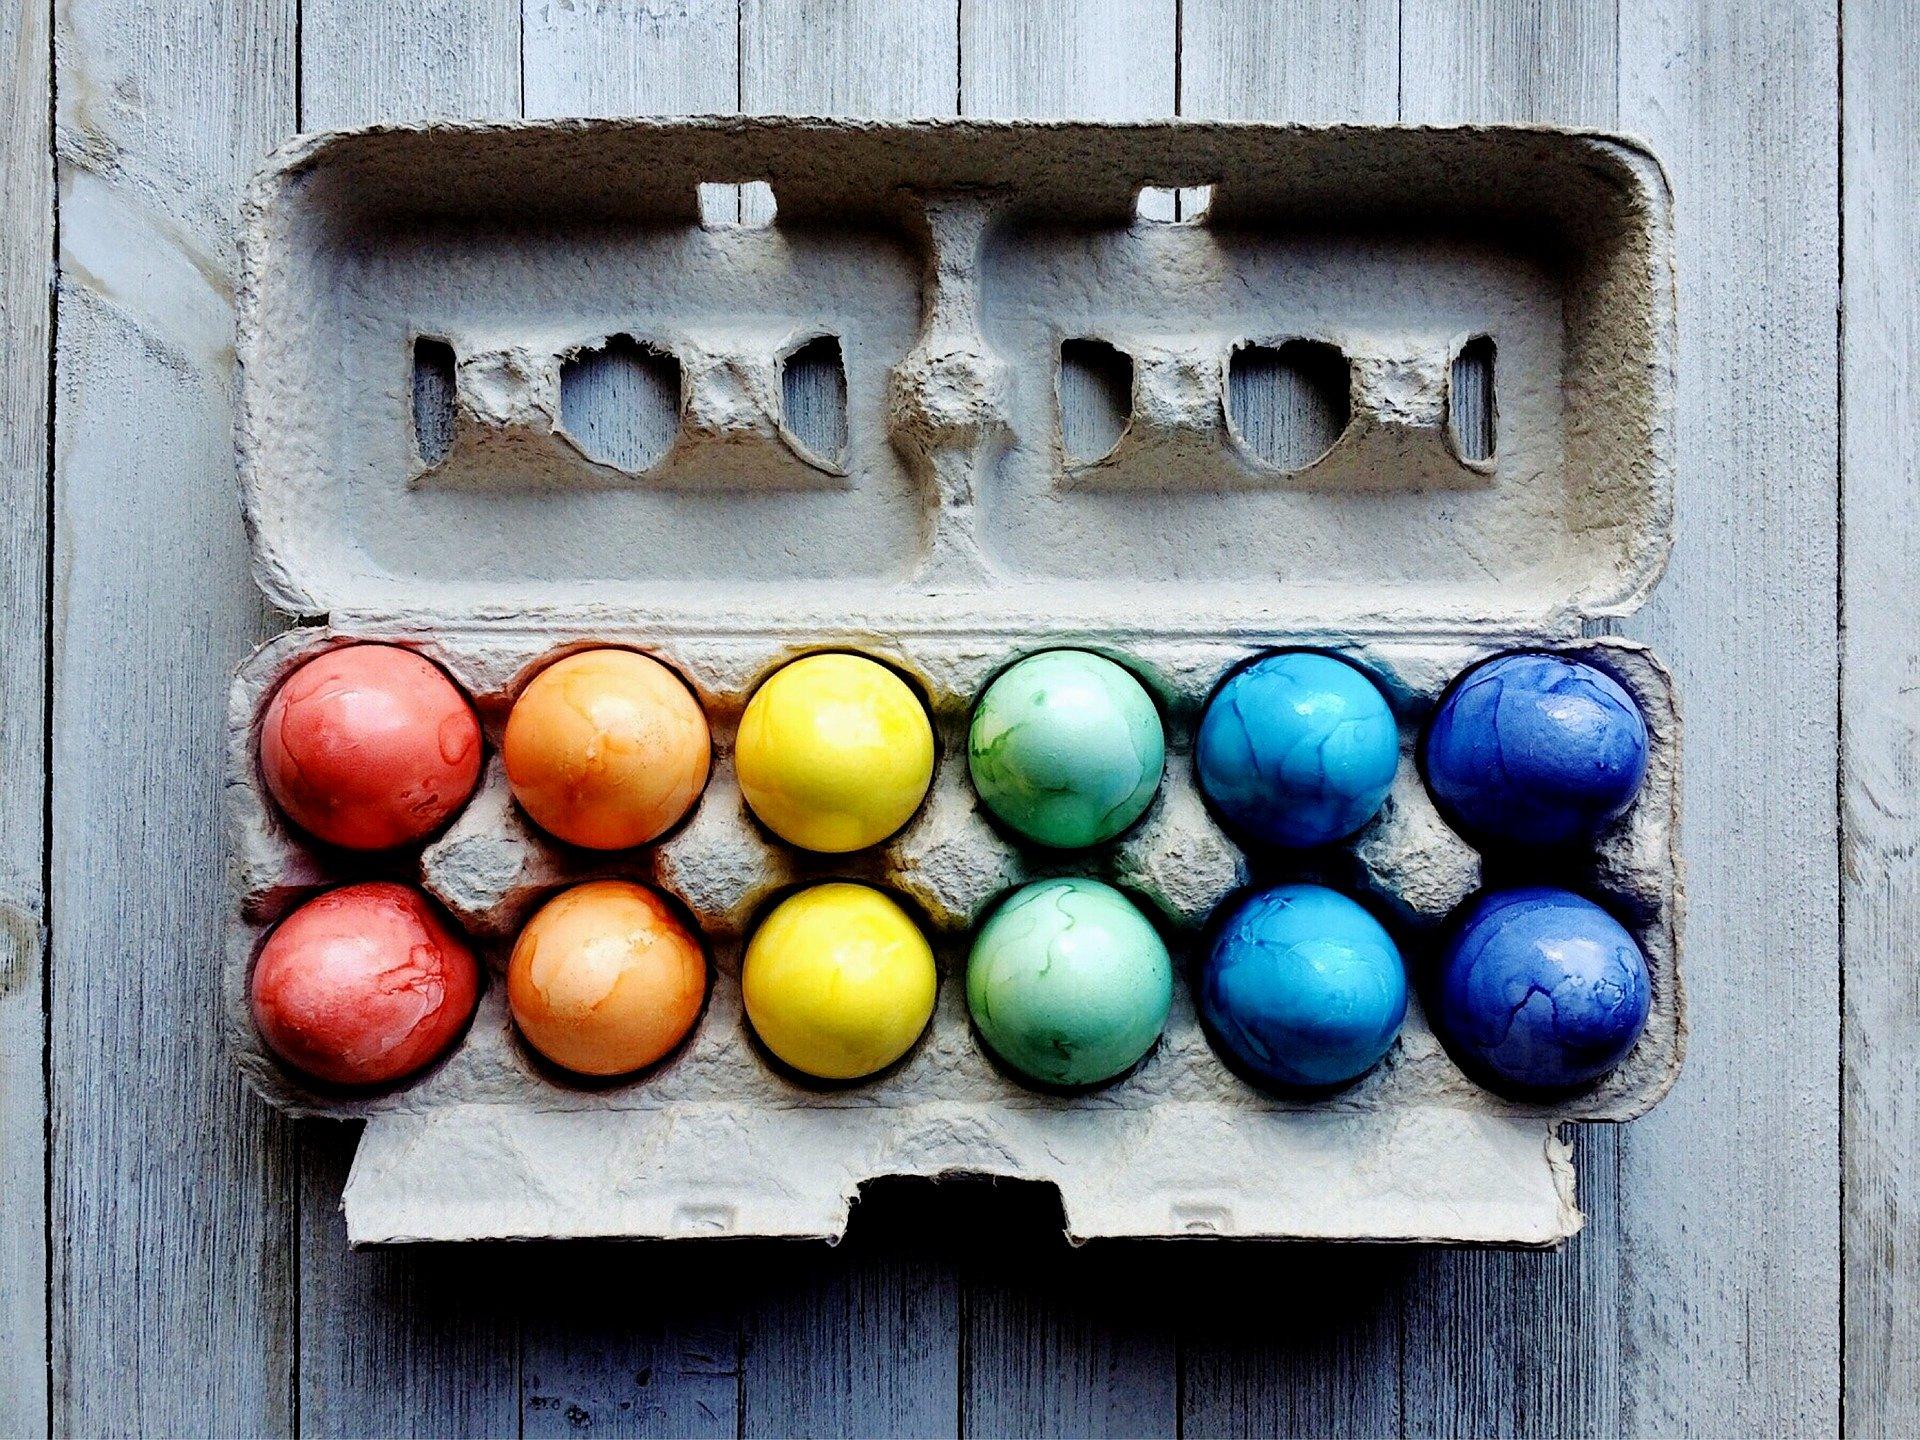 jajka jaja pisanki kolorowe jajka wielkanoc